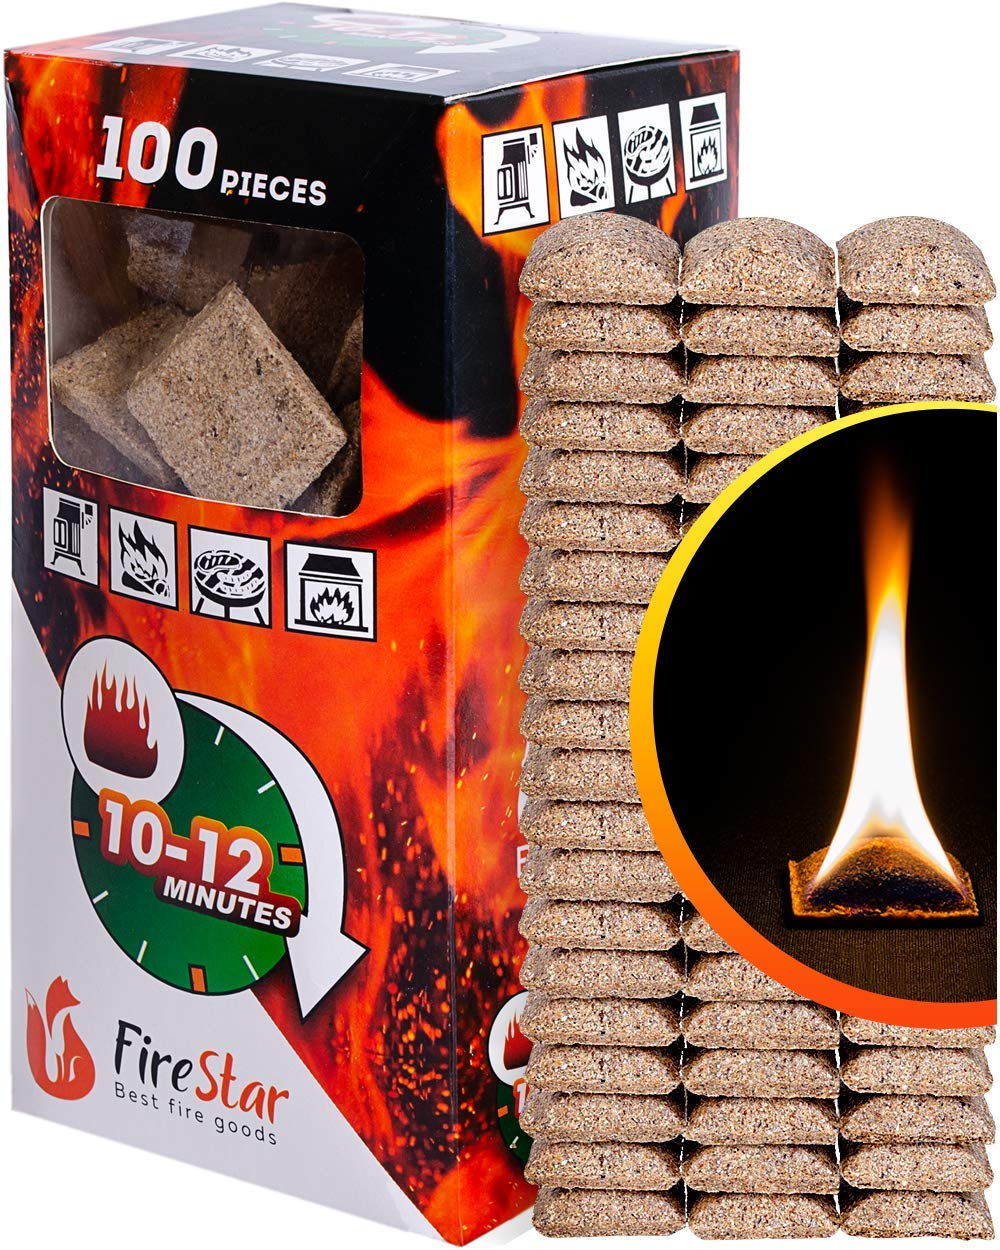 amazon com fire starter squares 100pc fire starters for fireplace rh amazon com fireplace fire starters homemade fireplace fire starter log